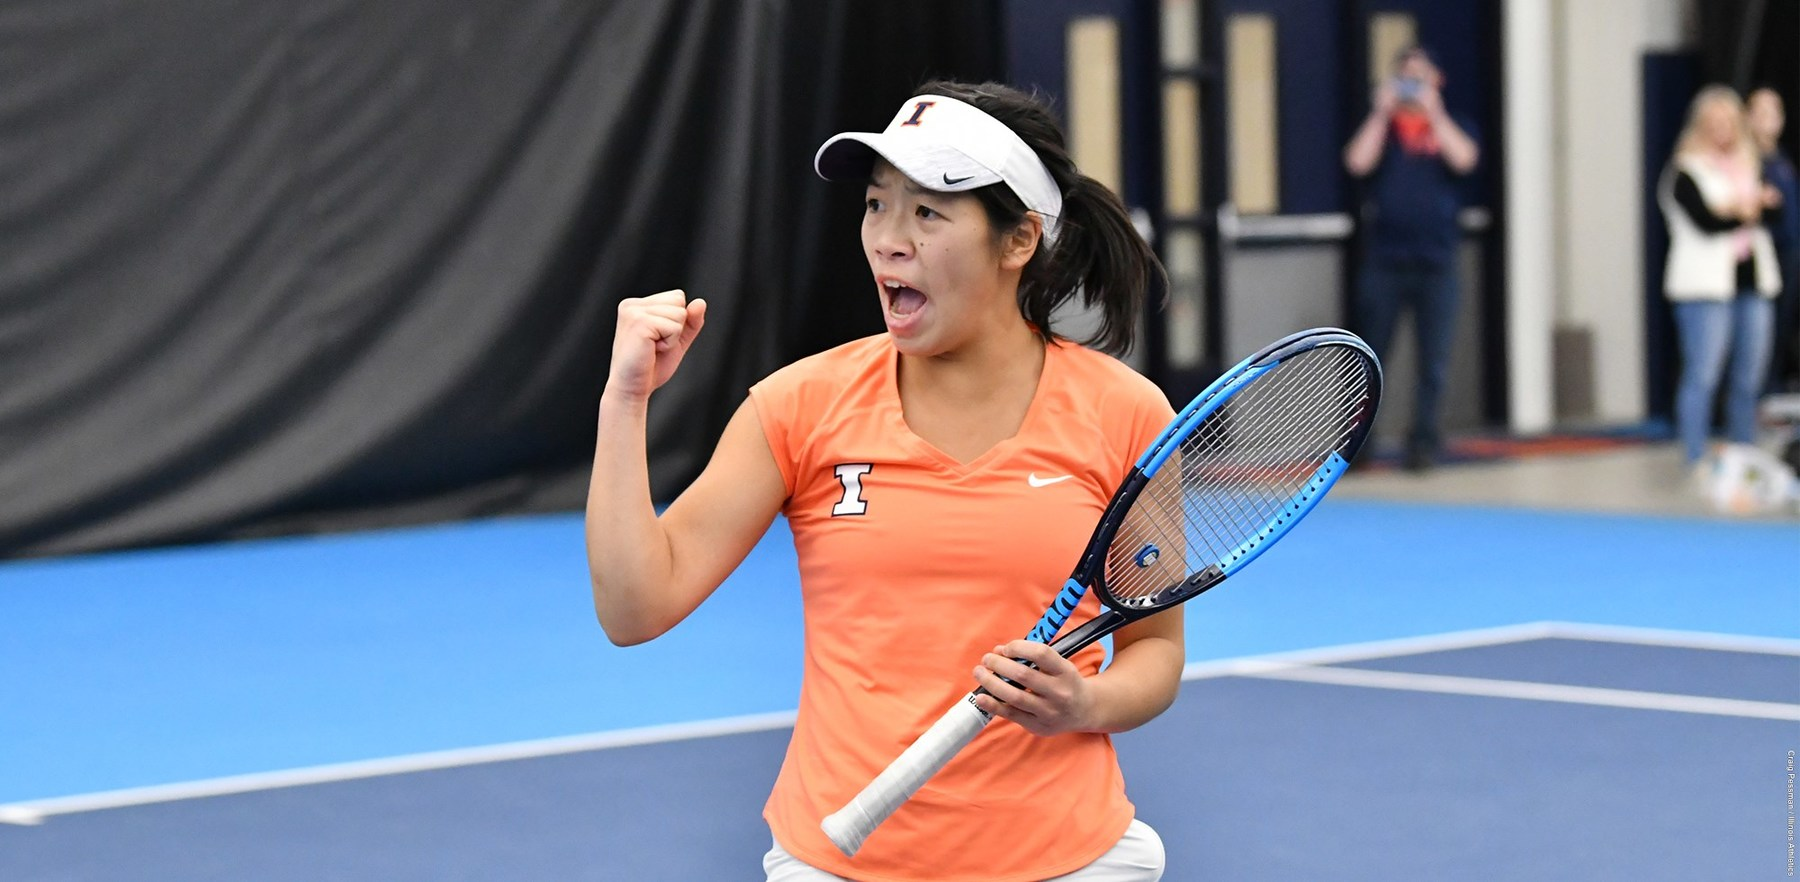 Asuka Kawai on the court at the USTA National Campus in Orlando, Fla.